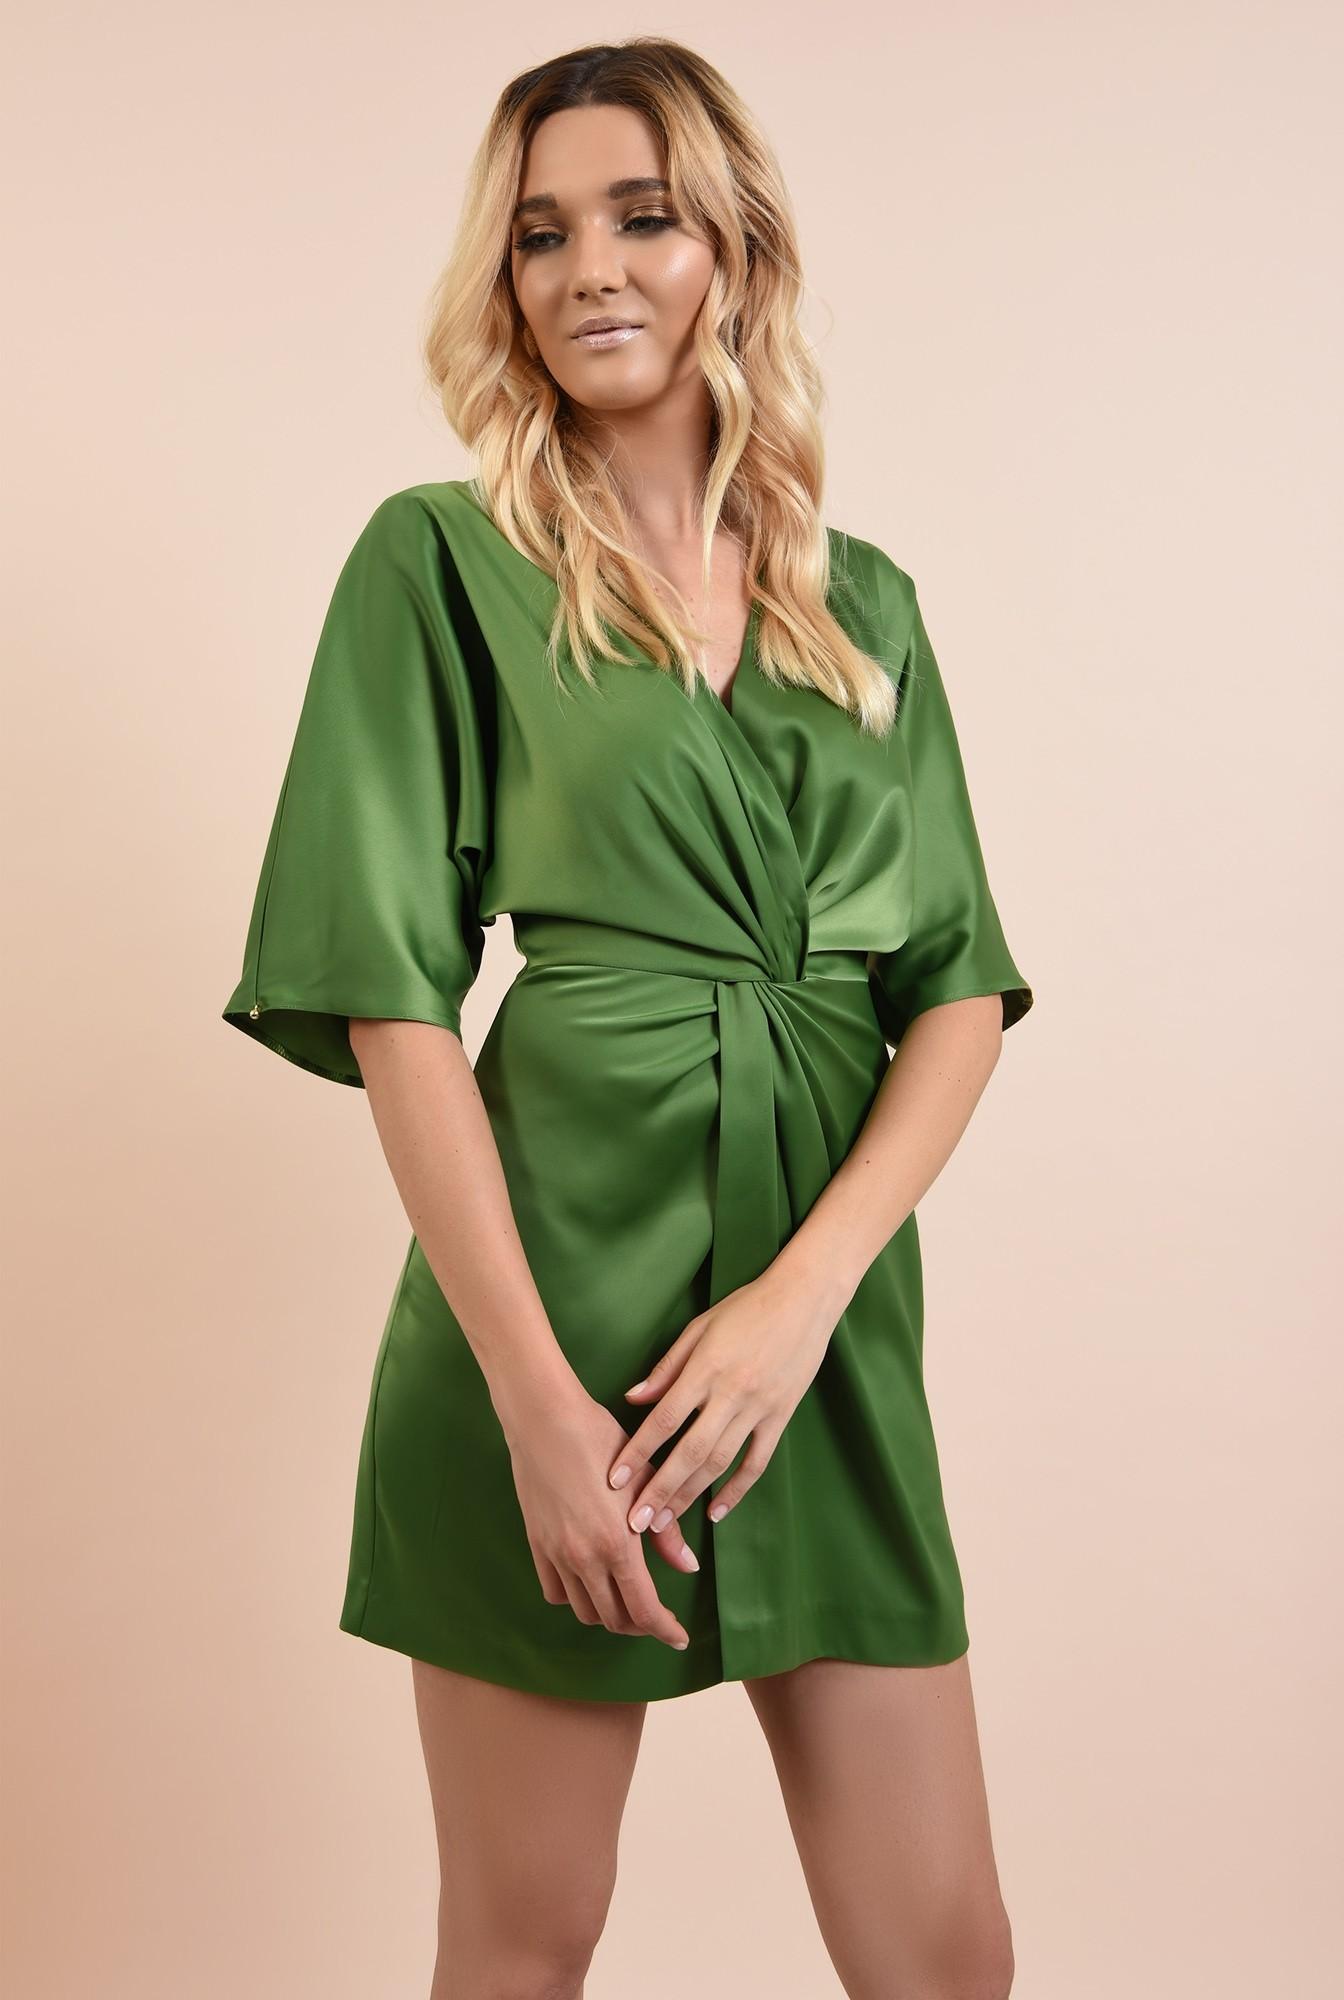 0 - rochie eleganta, verde, din satin, anchior petrecut, talie drapata